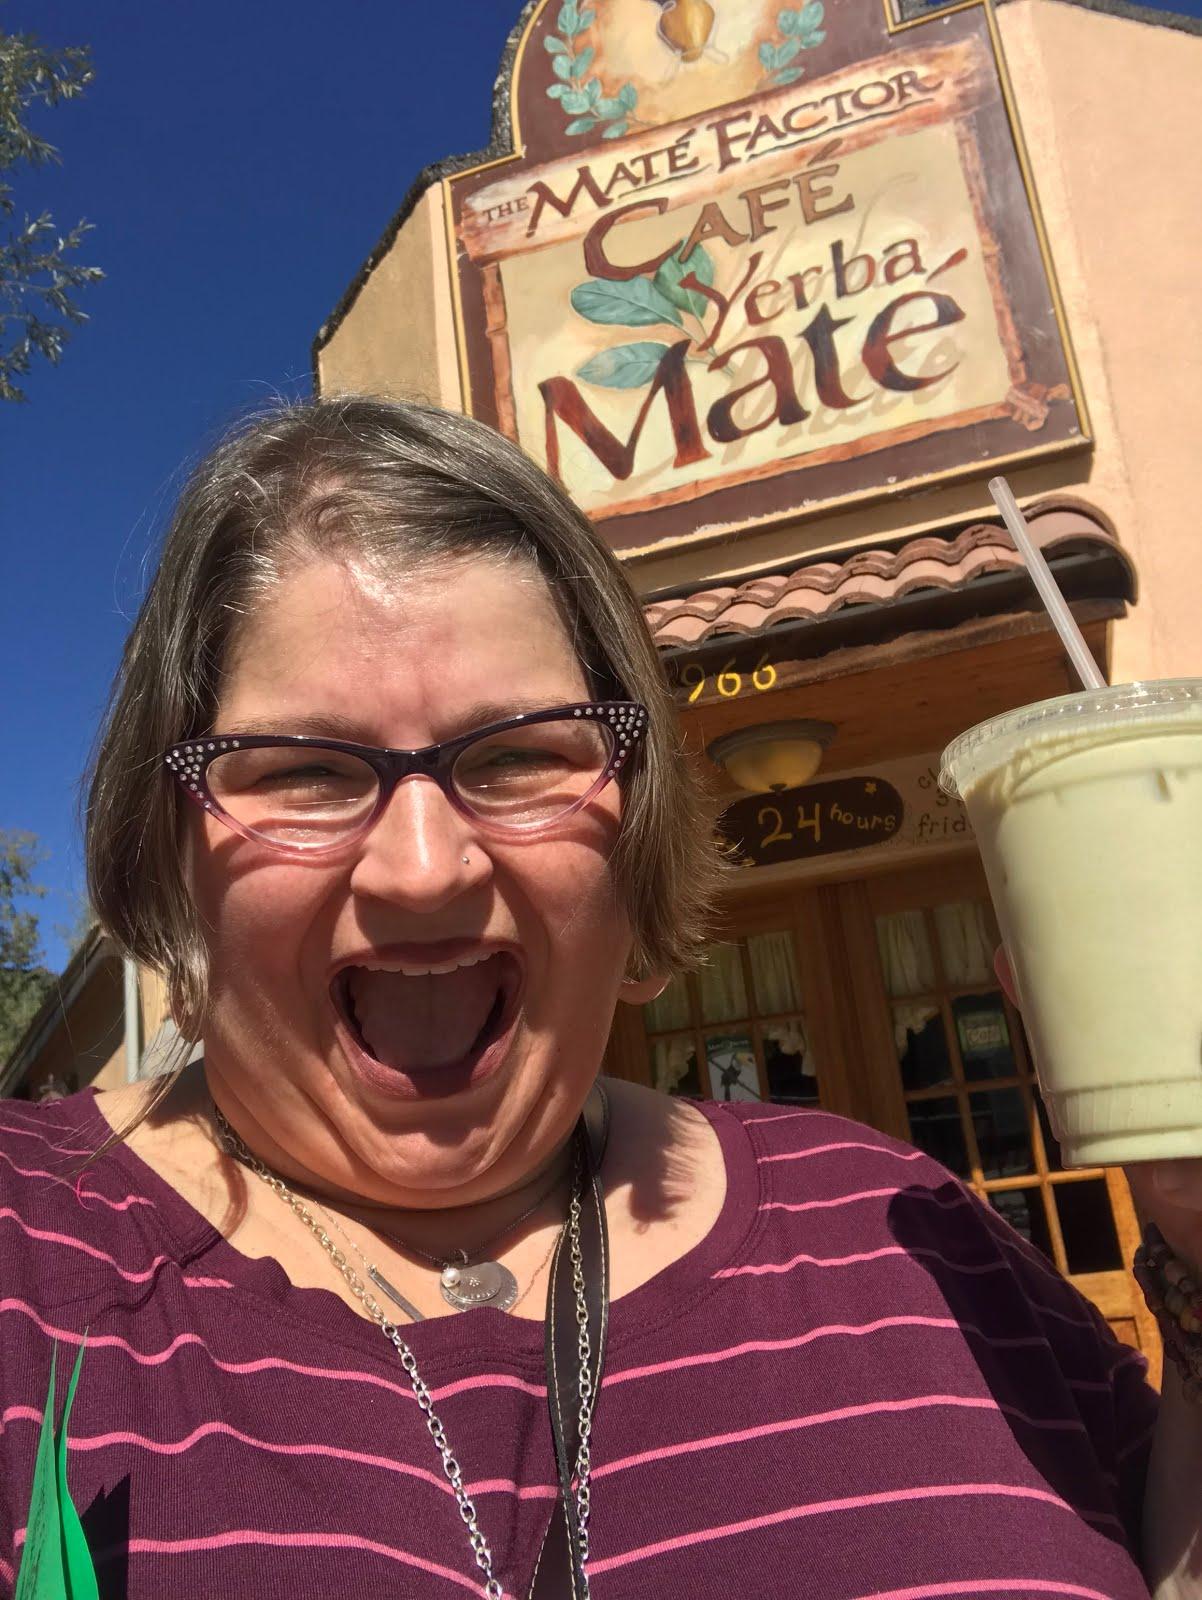 Mate Factor- Cafe Yerba Mate, Manitou SPrings Colorado 2018